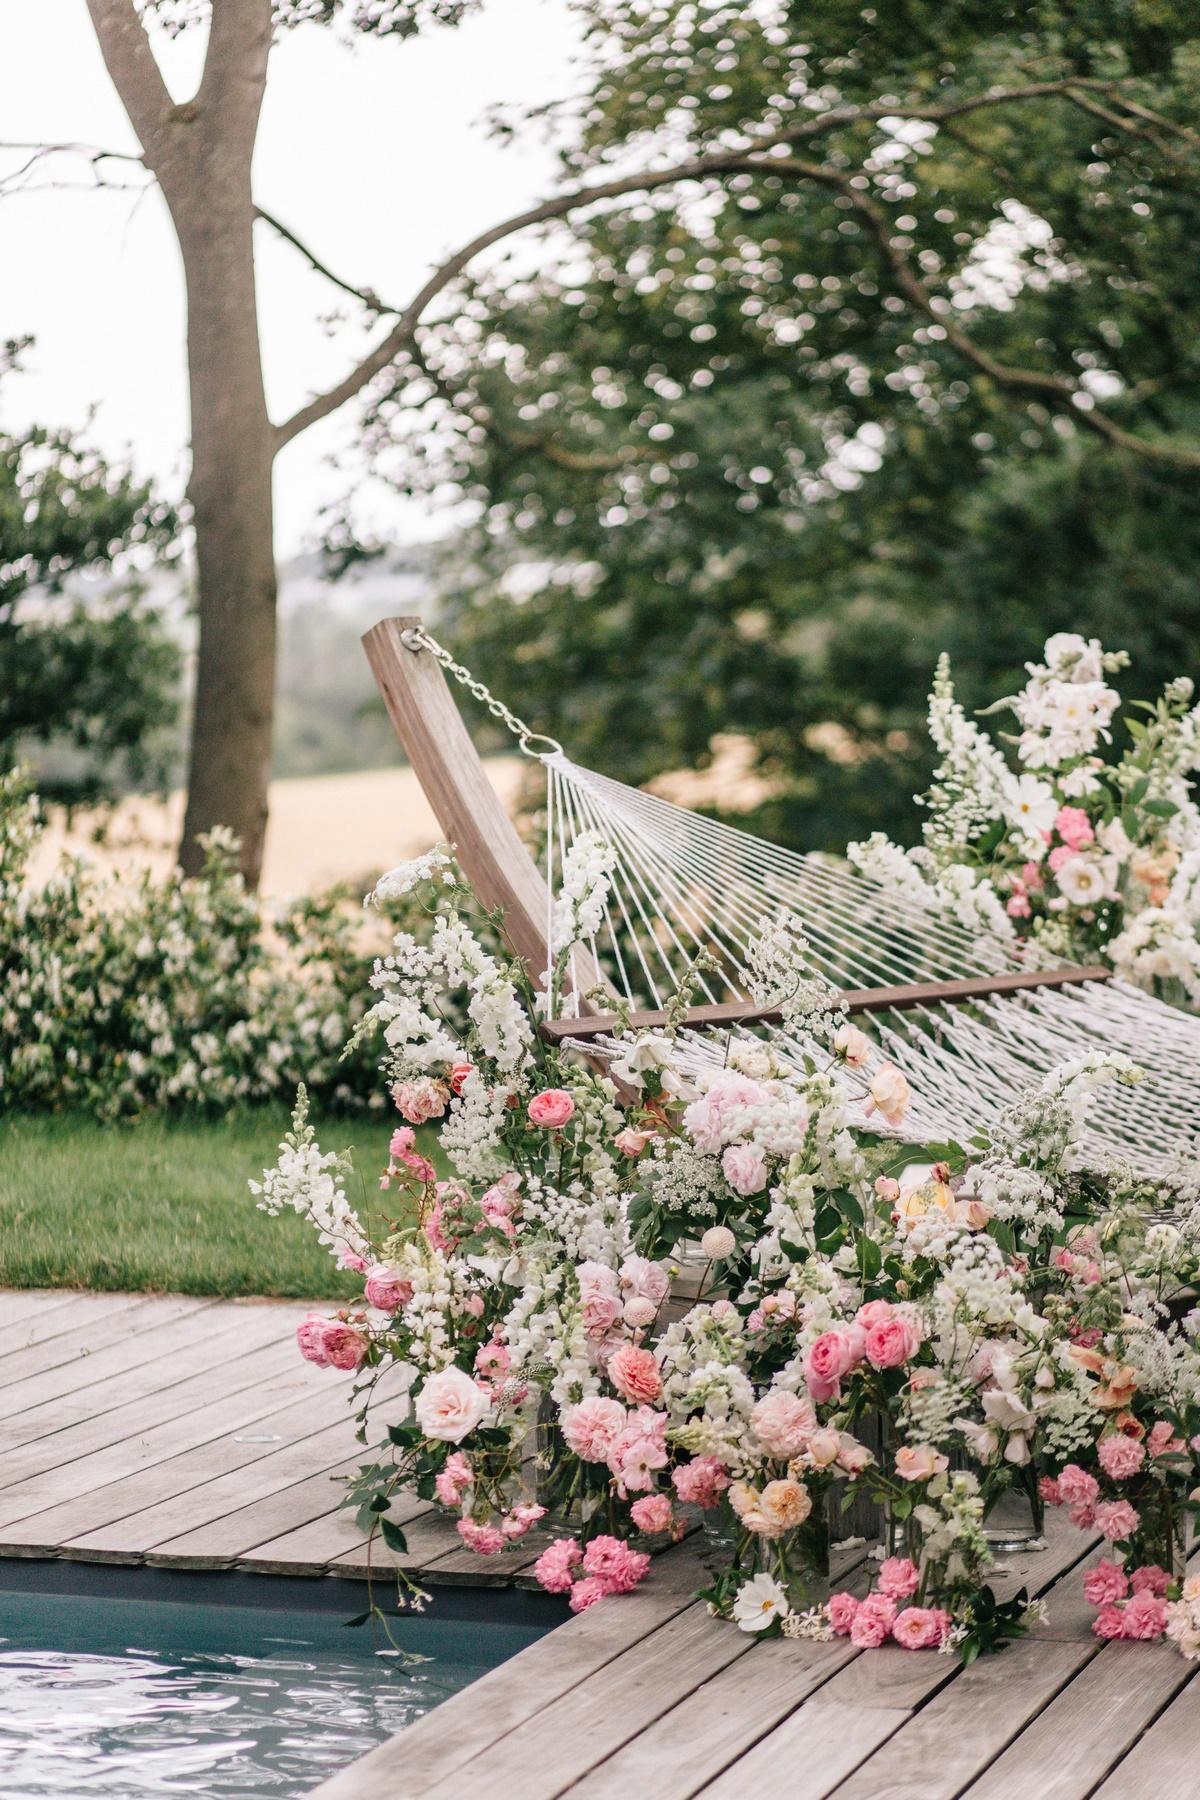 Lendemain de mariage, shooting éditorial mariage, chateau de la ballue, hamac fleuri